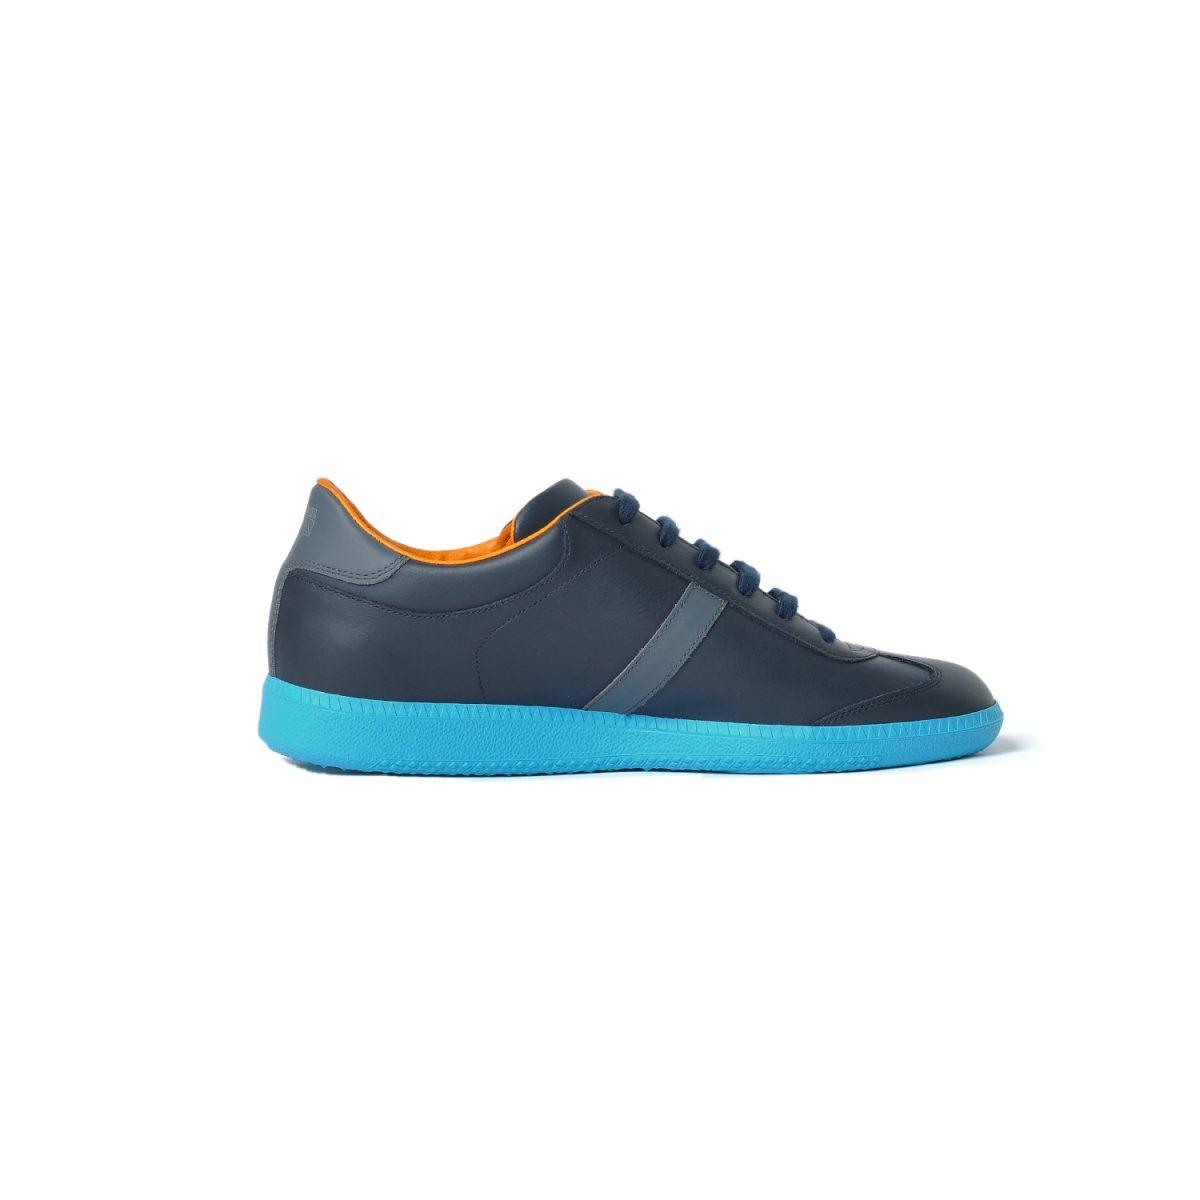 Tisza shoes - Compakt - Soda - Győr limited edition